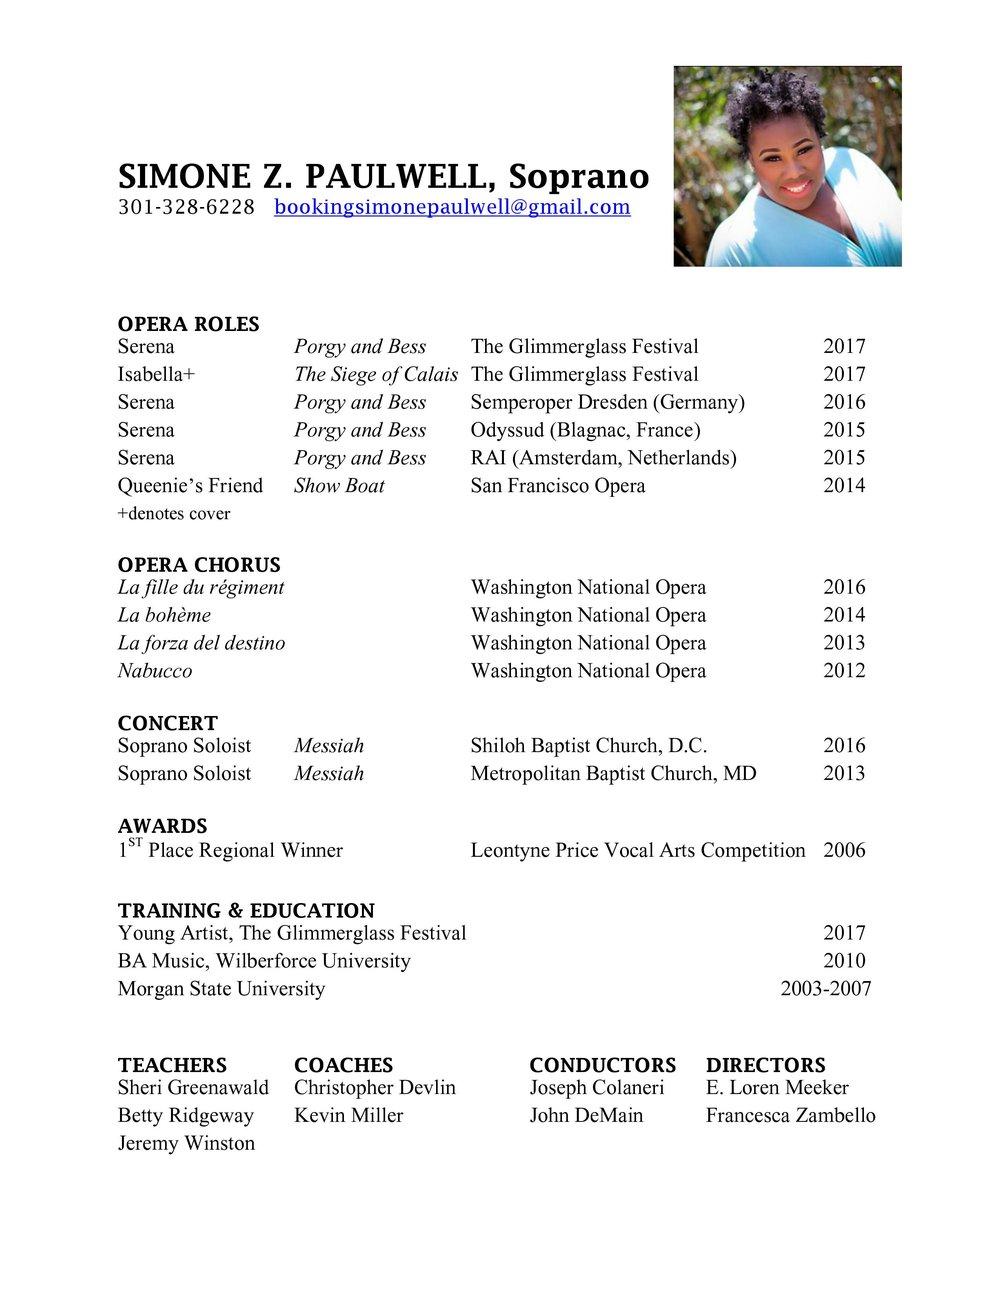 Simone Paulwell Resume Pic.jpg